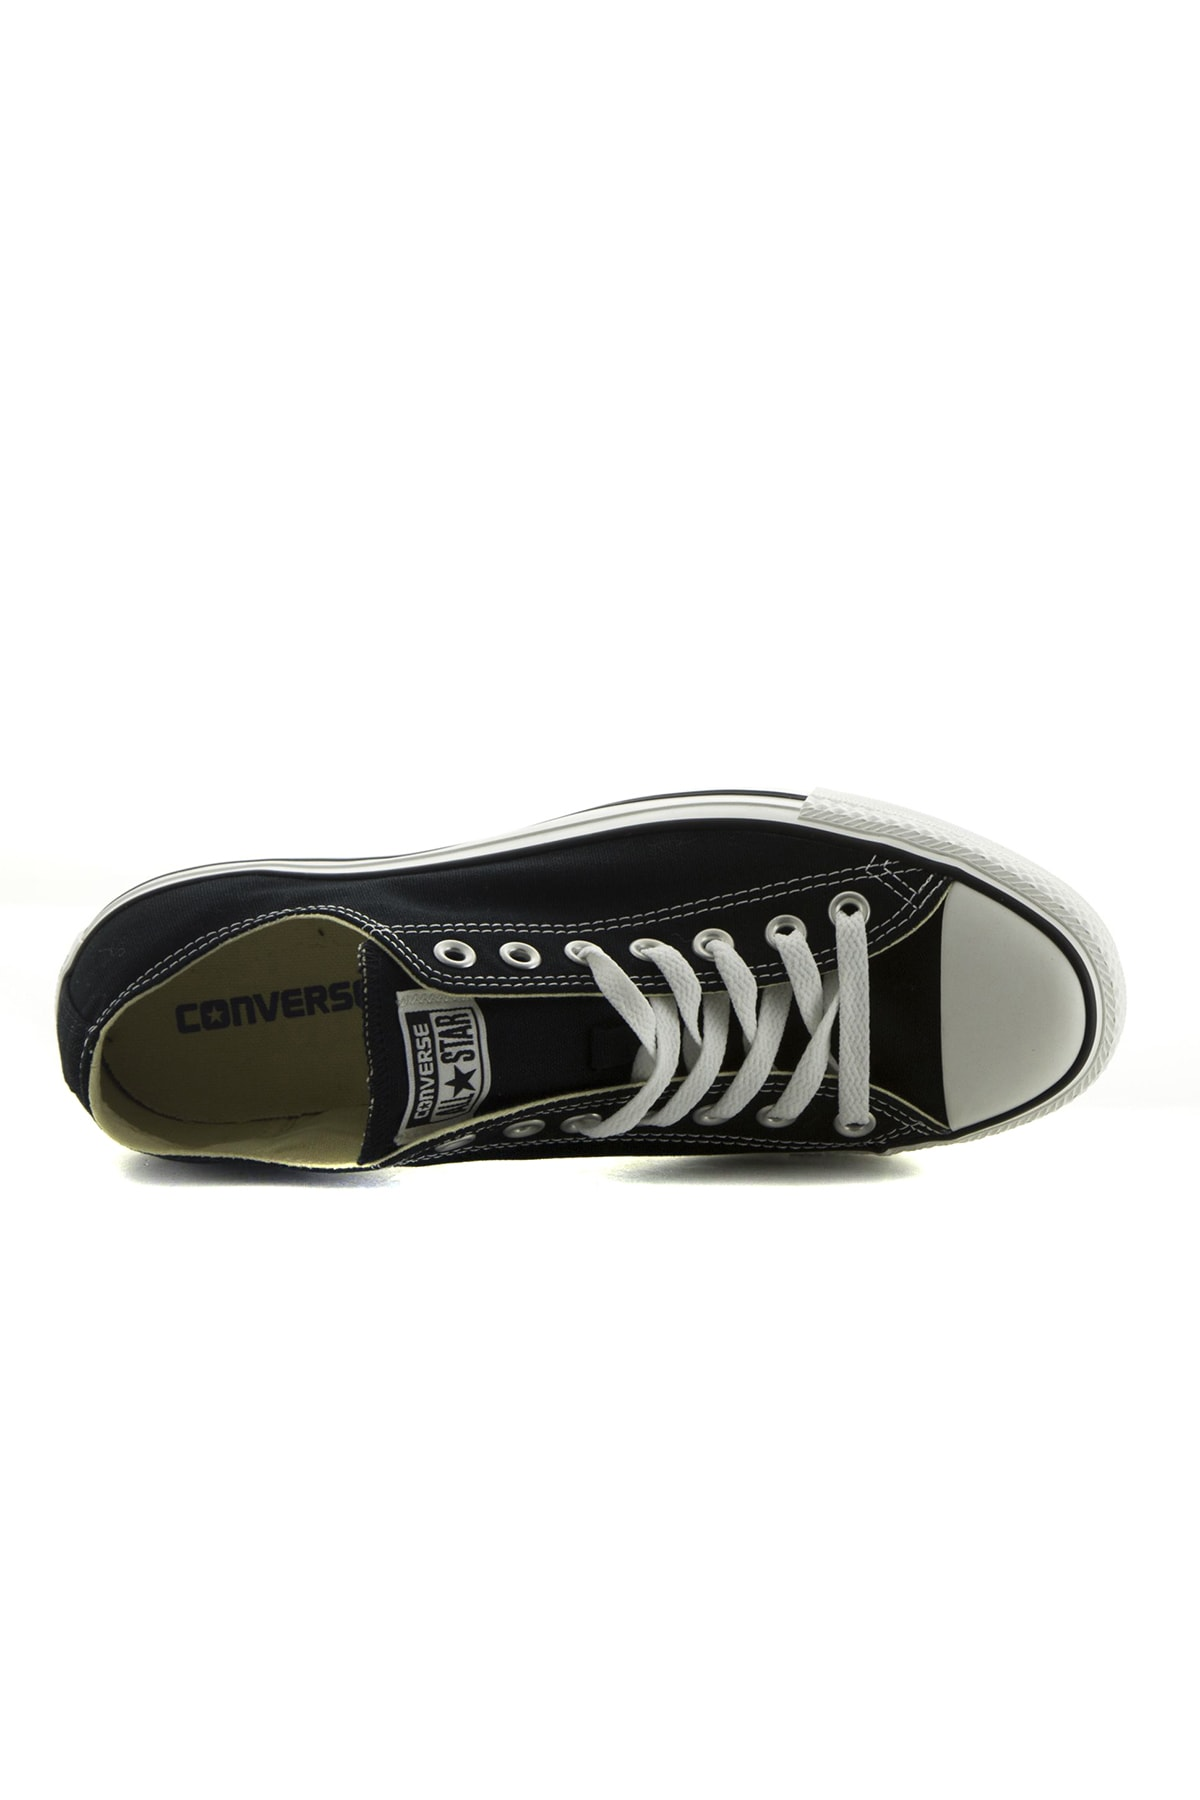 Converse Ayakkabı Chuck Taylor All Star M9166C 1